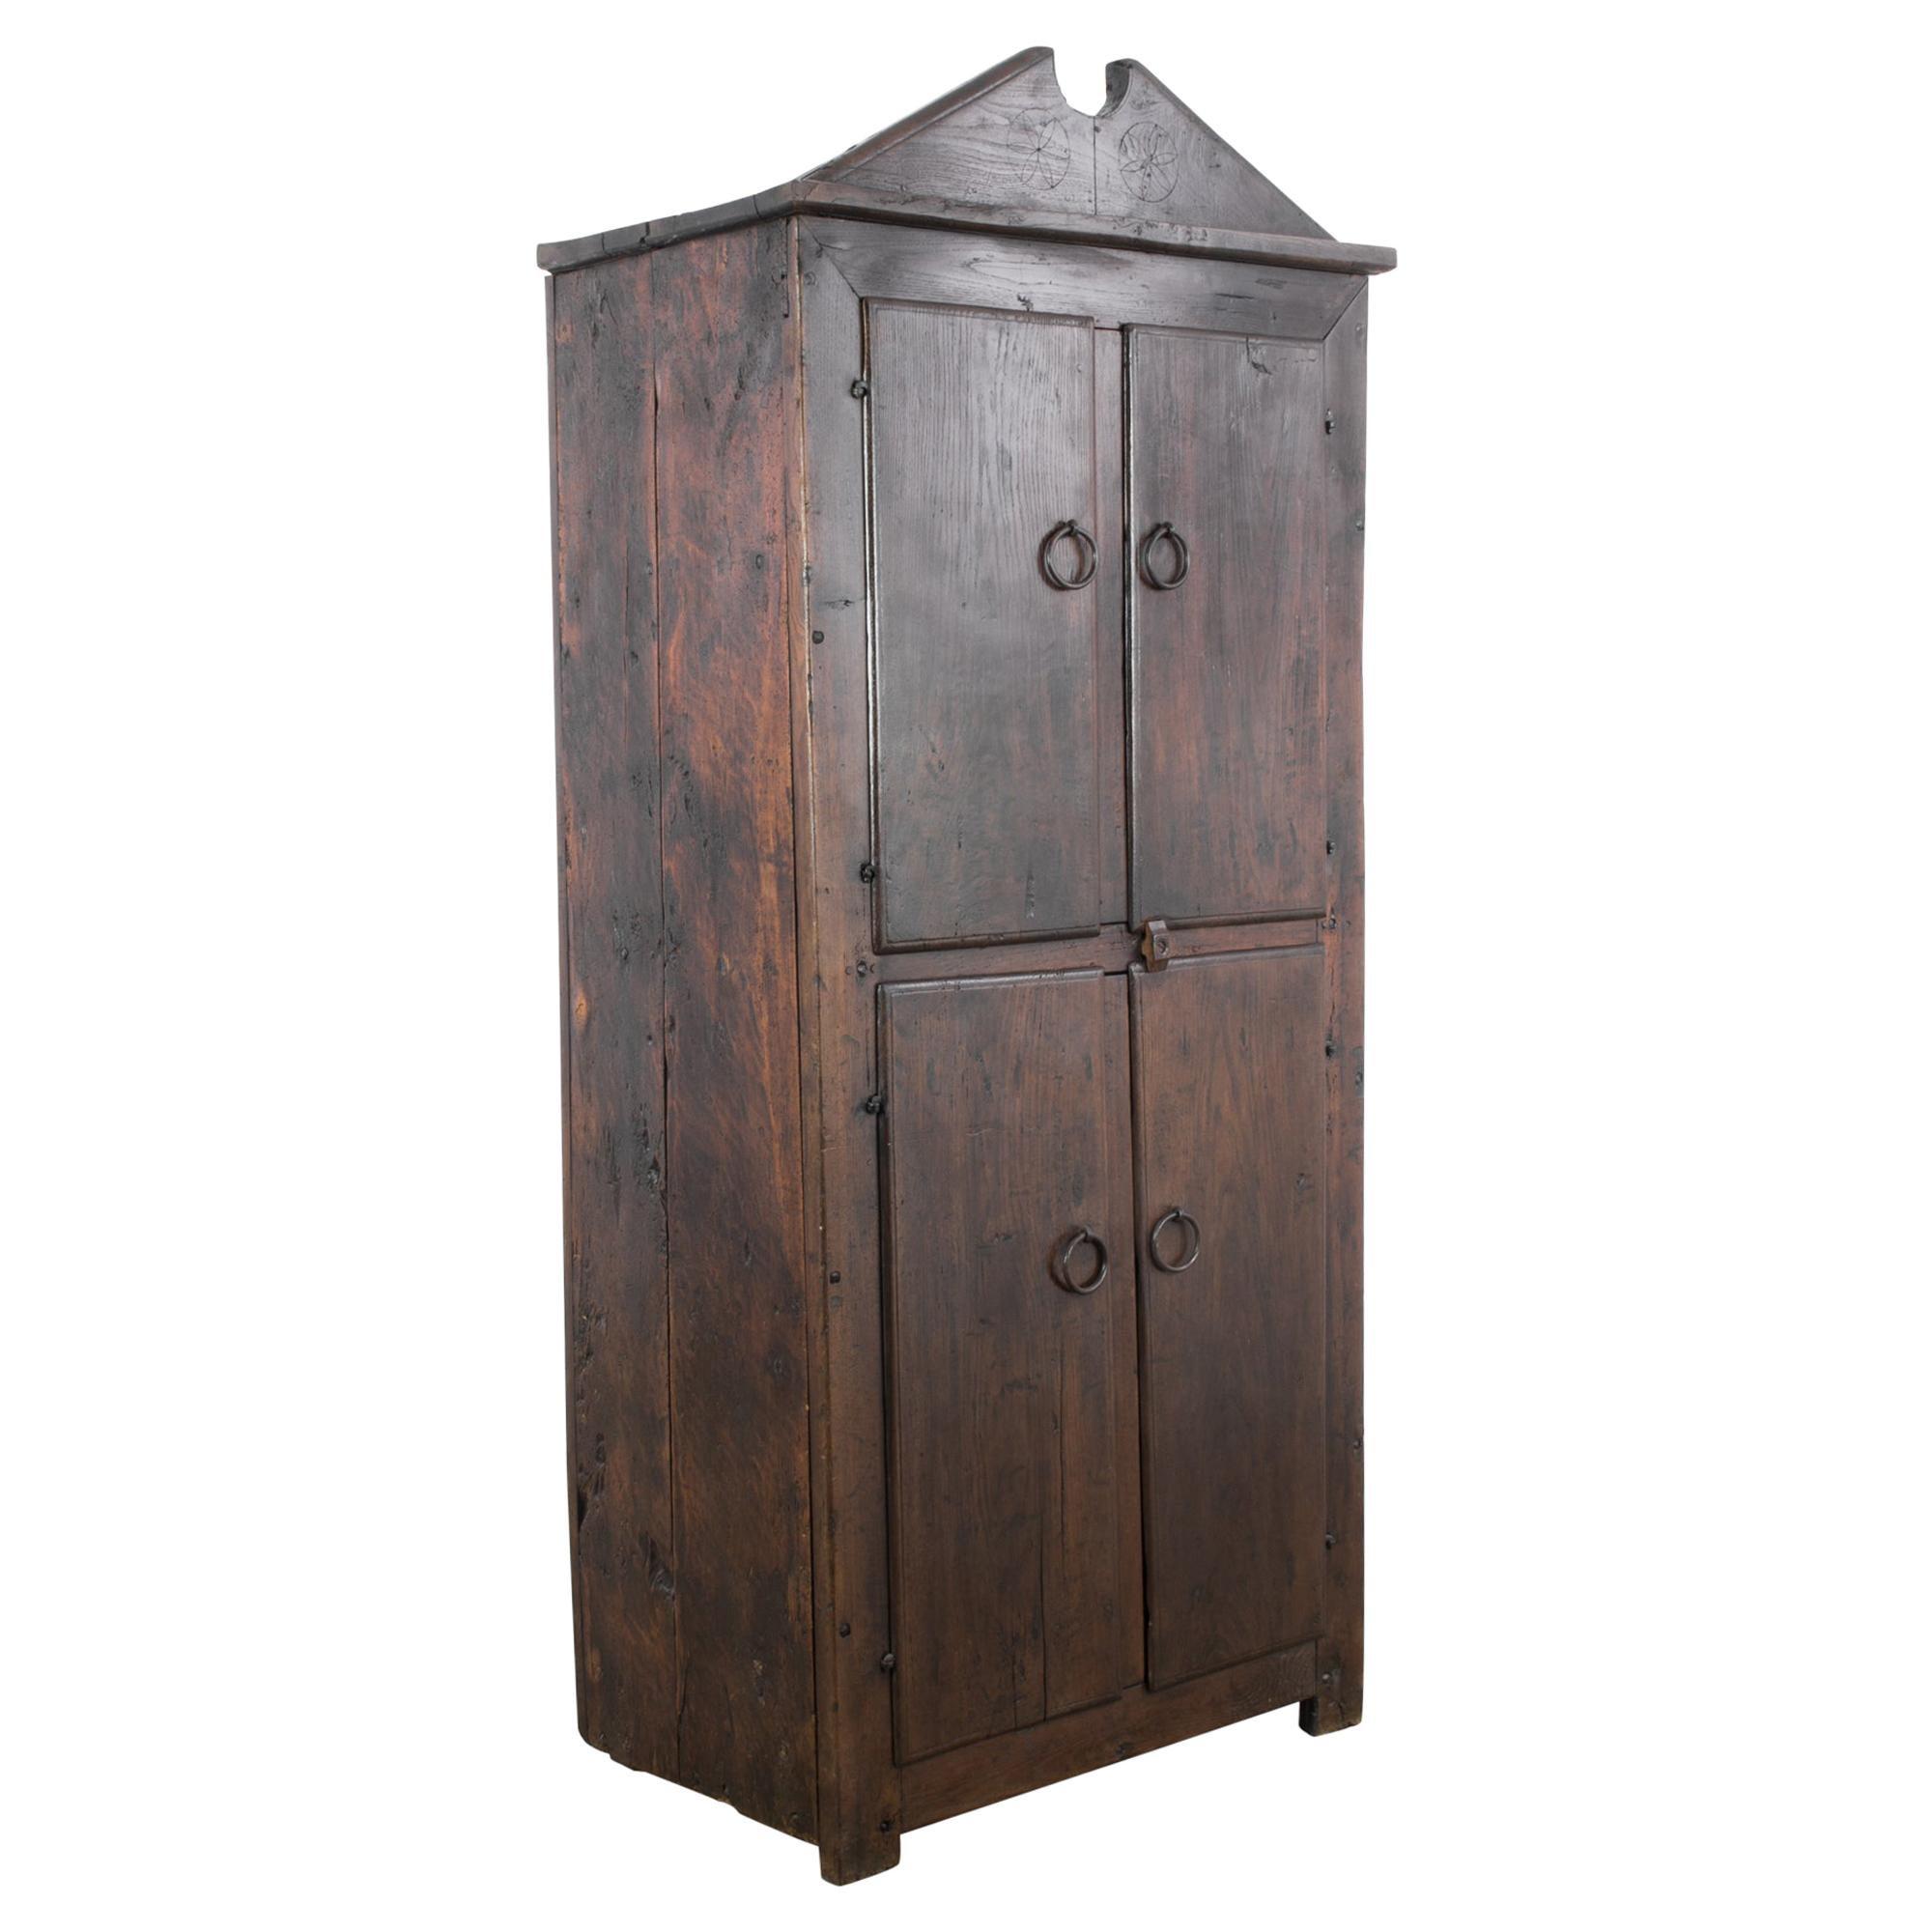 Antique Spanish Wooden Cabinet